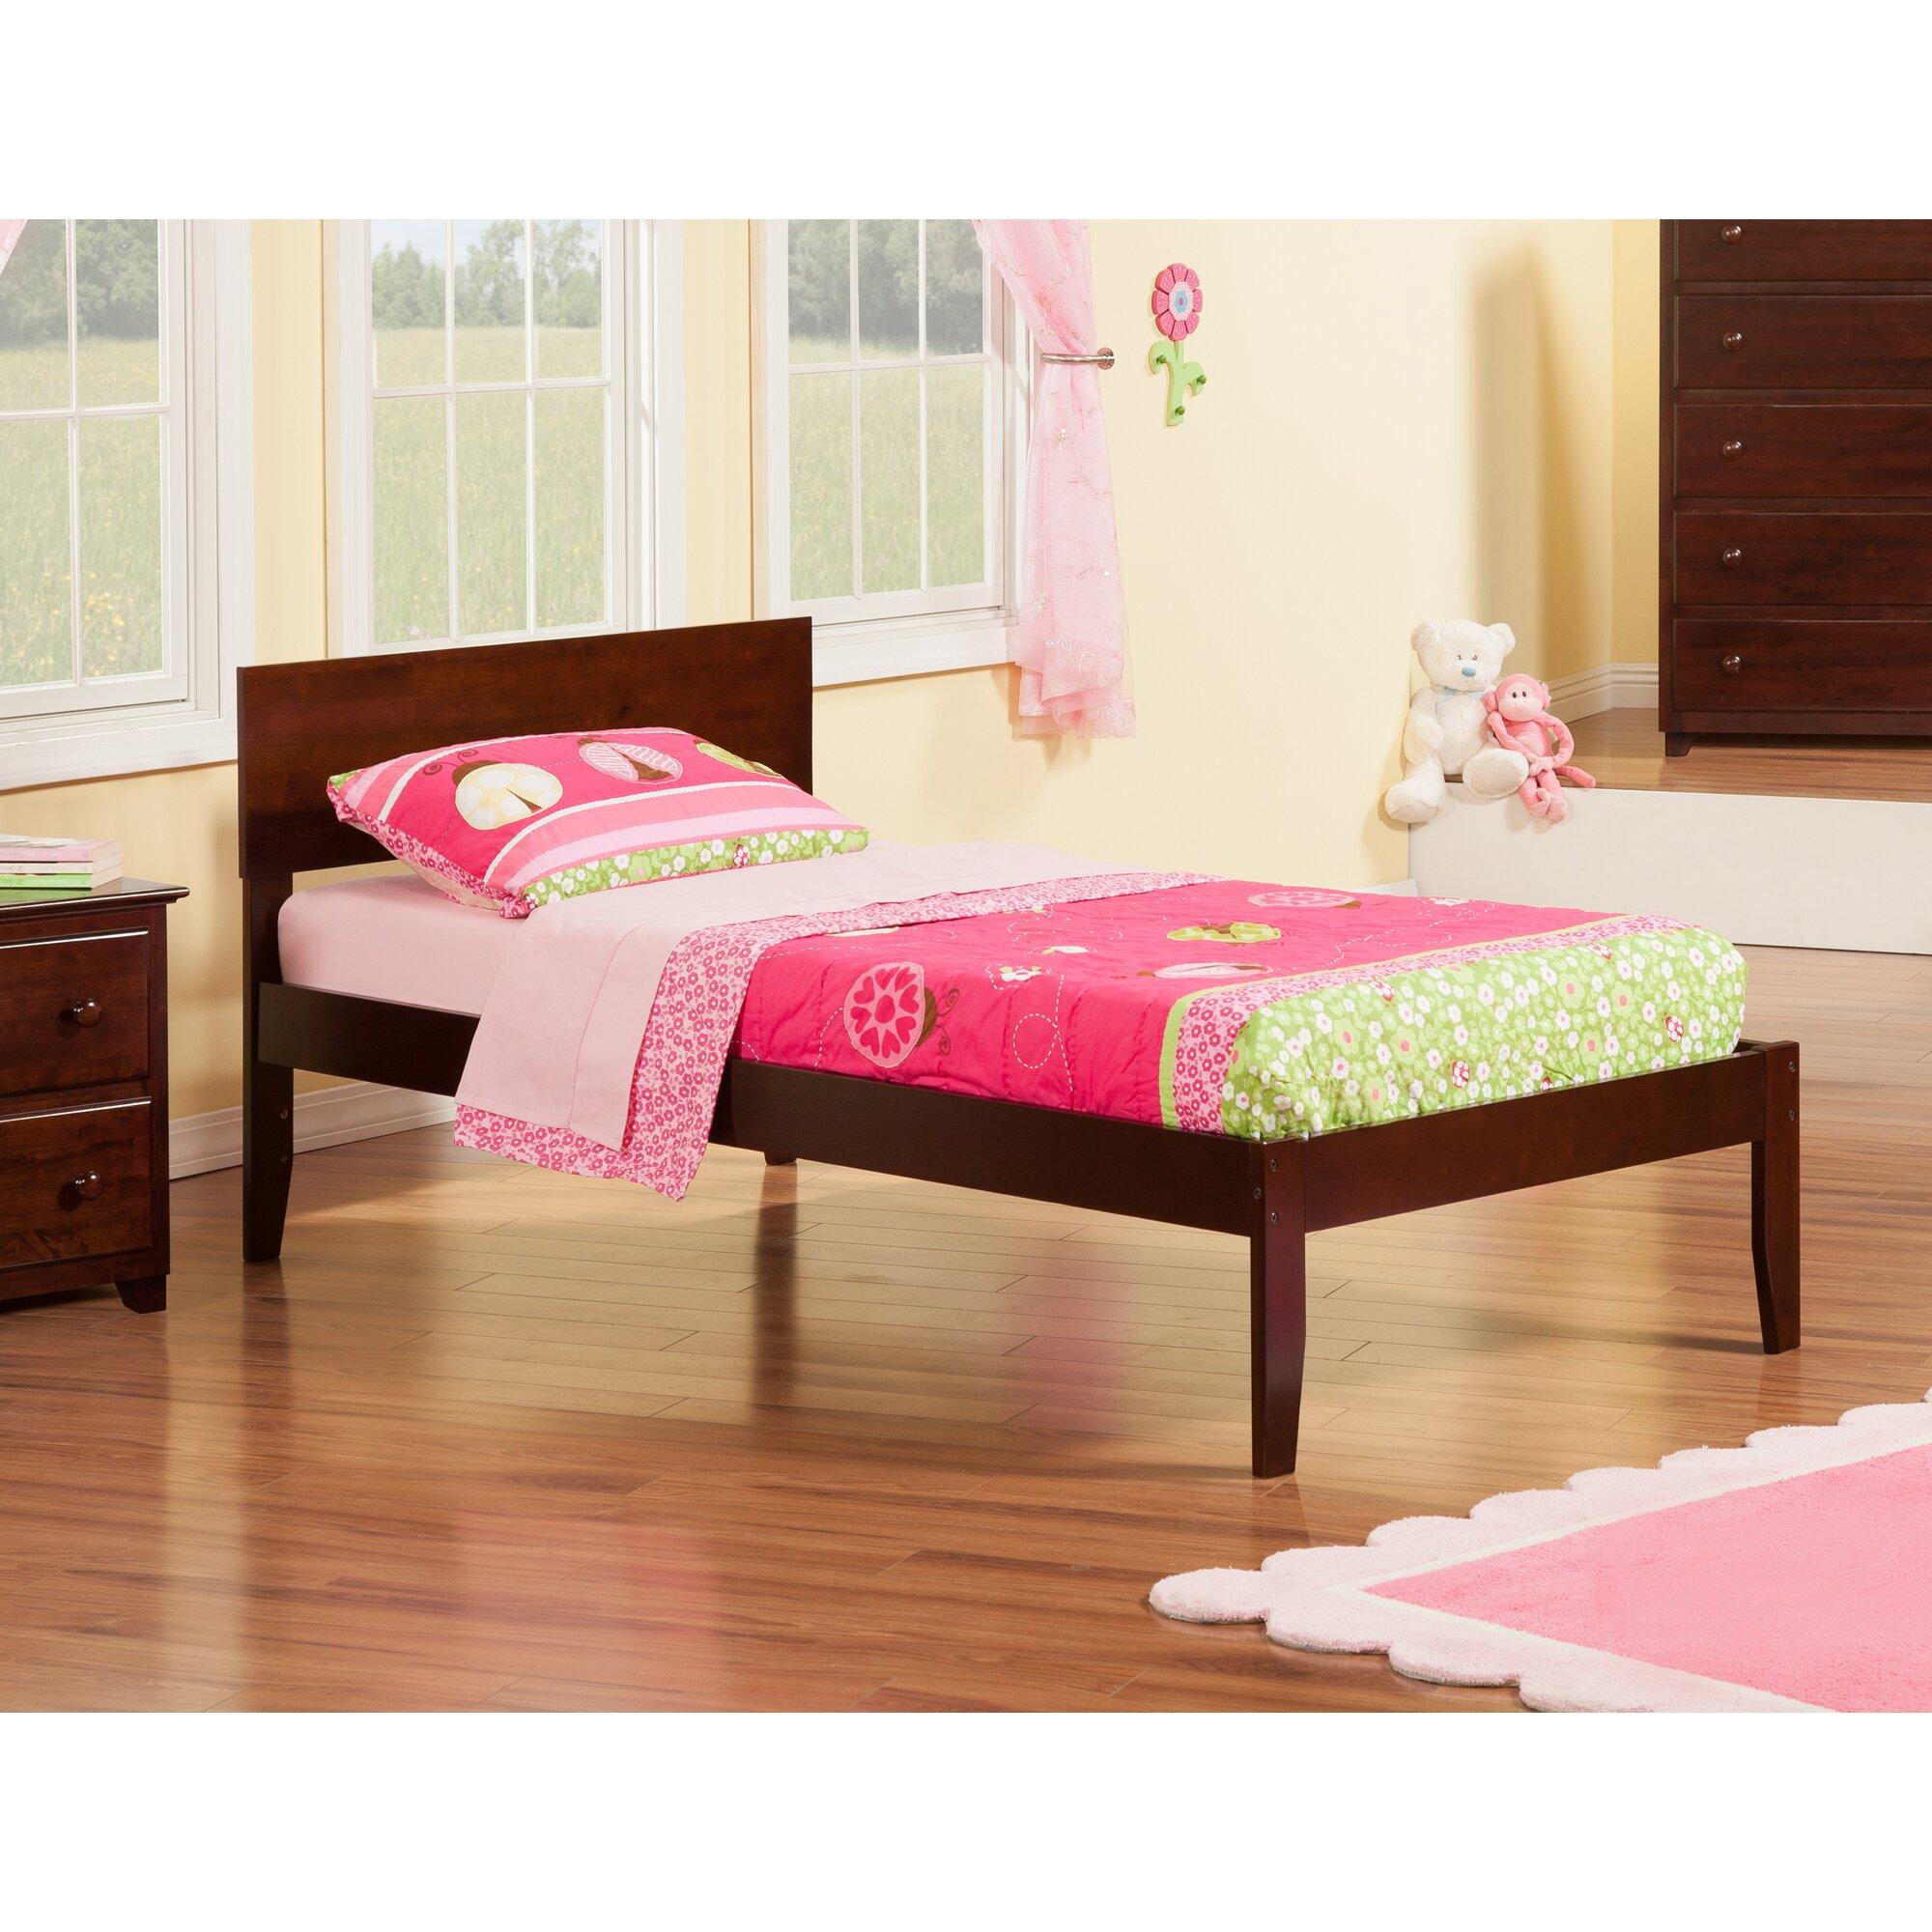 Viv Rae Mathias Extra Long Twin Panel Bed Reviews